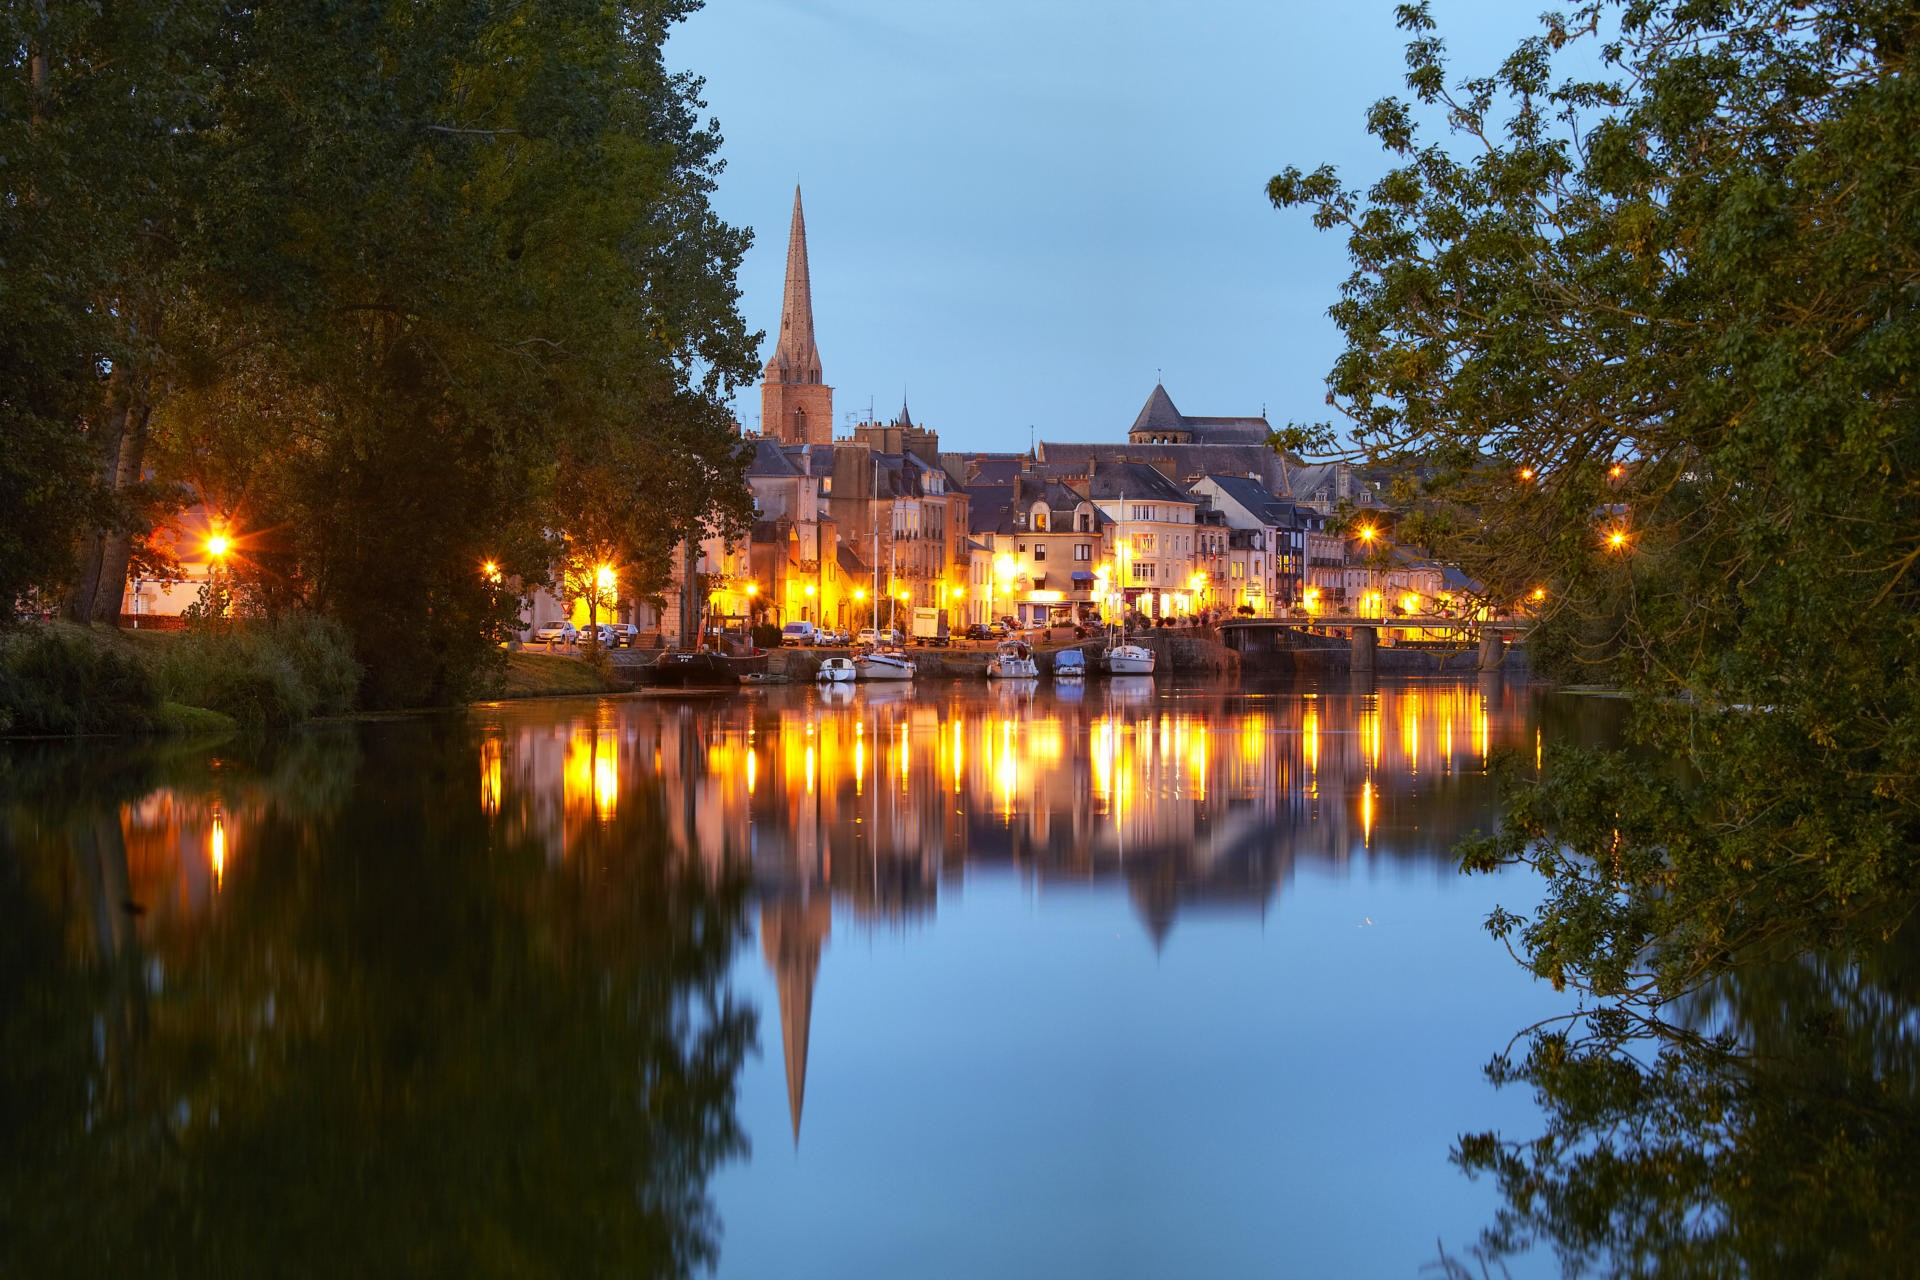 la Velodyssee, le canal la nuit